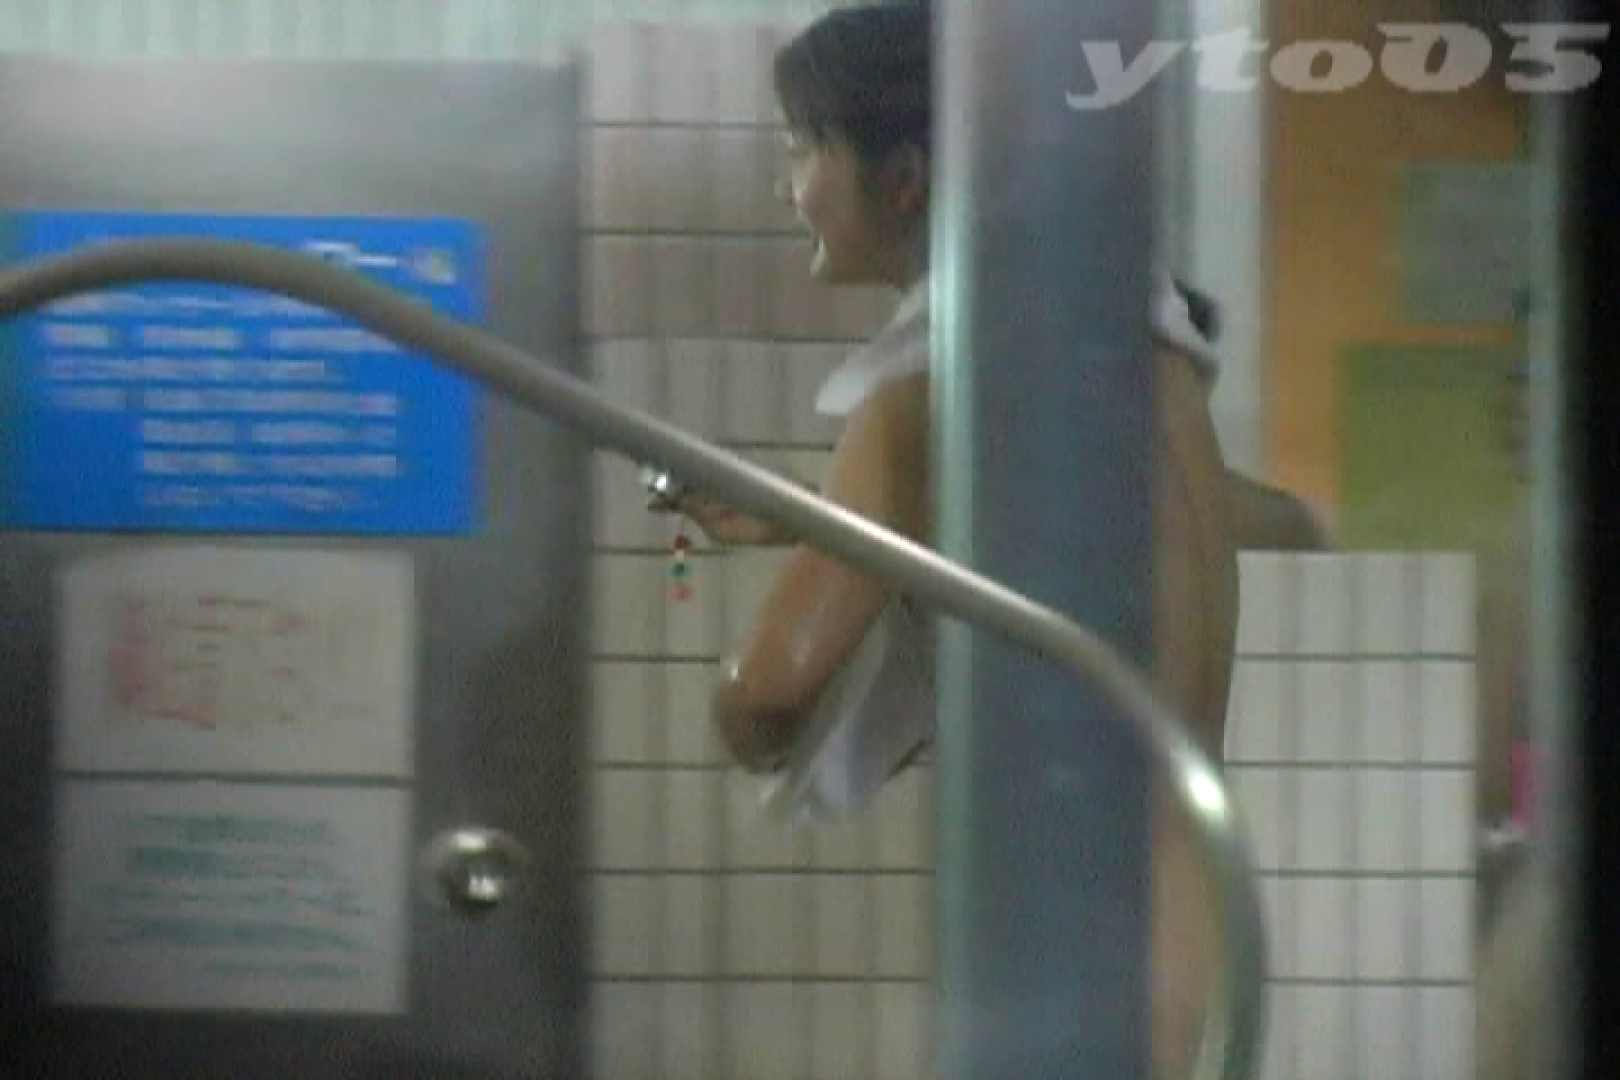 ▲復活限定▲合宿ホテル女風呂盗撮 Vol.31 0  84連発 56